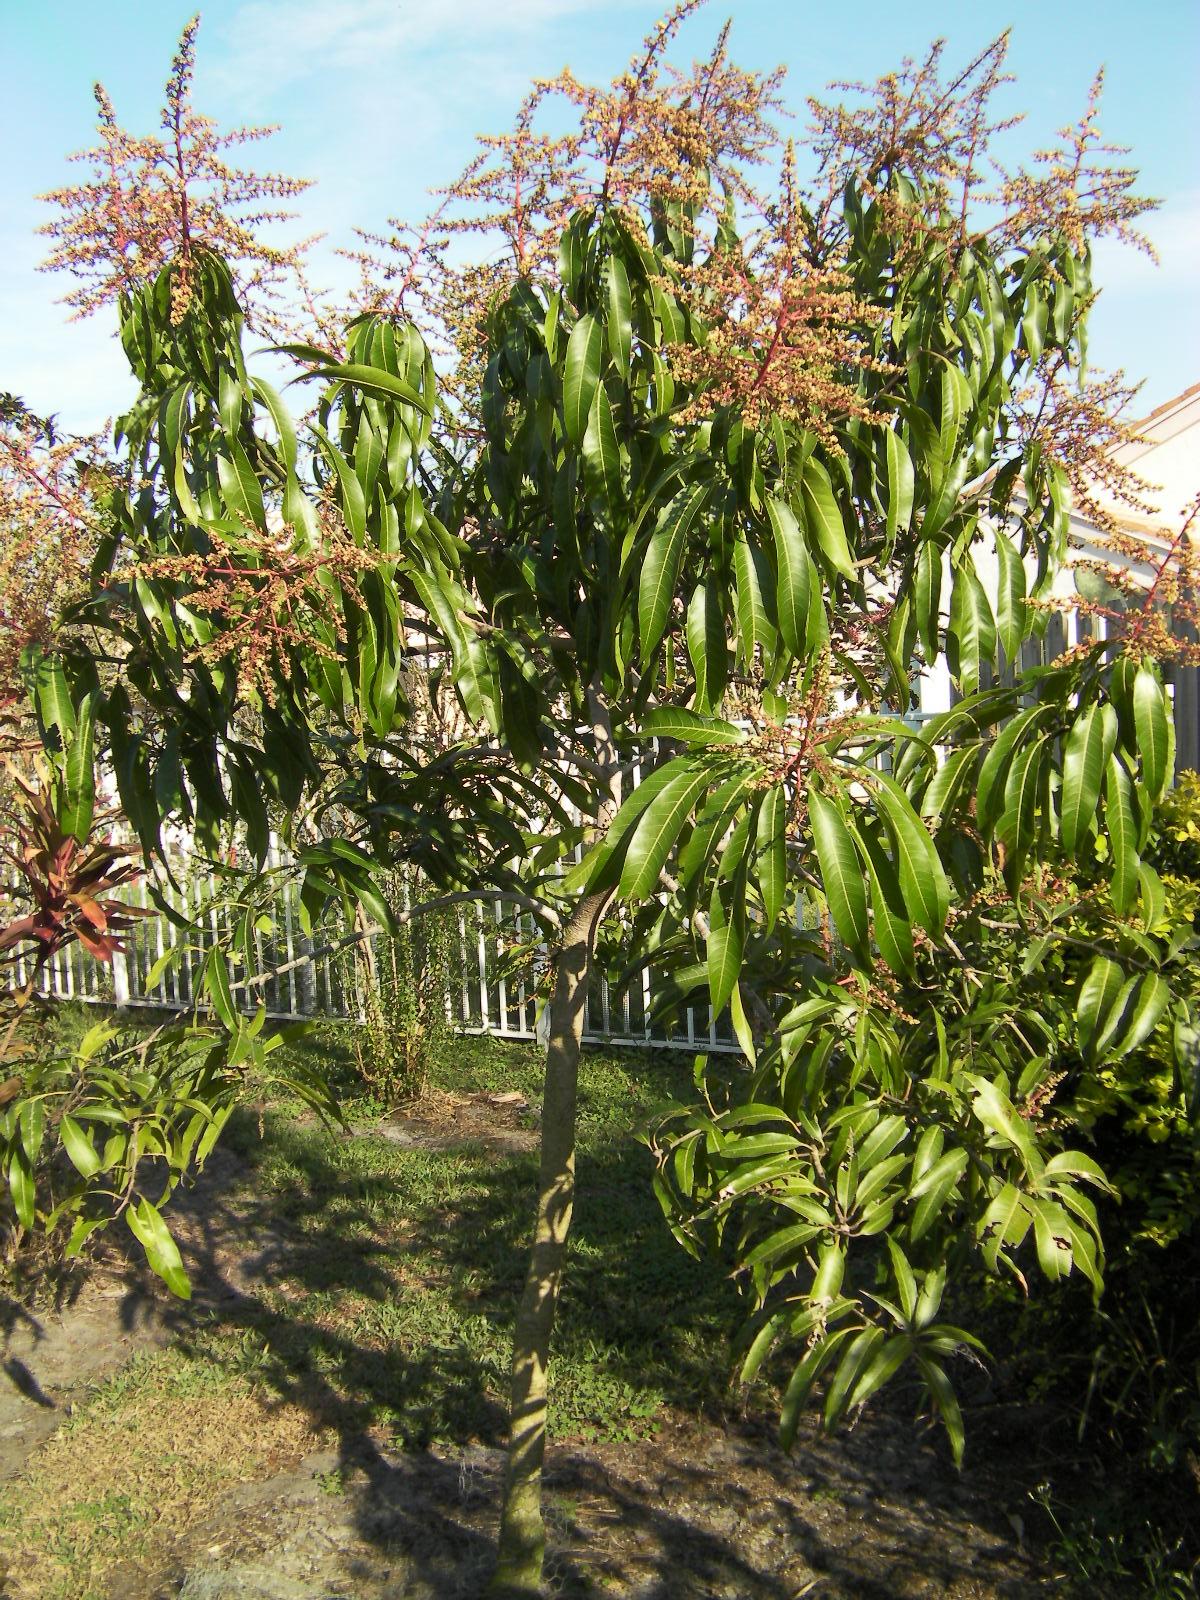 The Budget Gardener Mango Trees In Bloom Everywhere